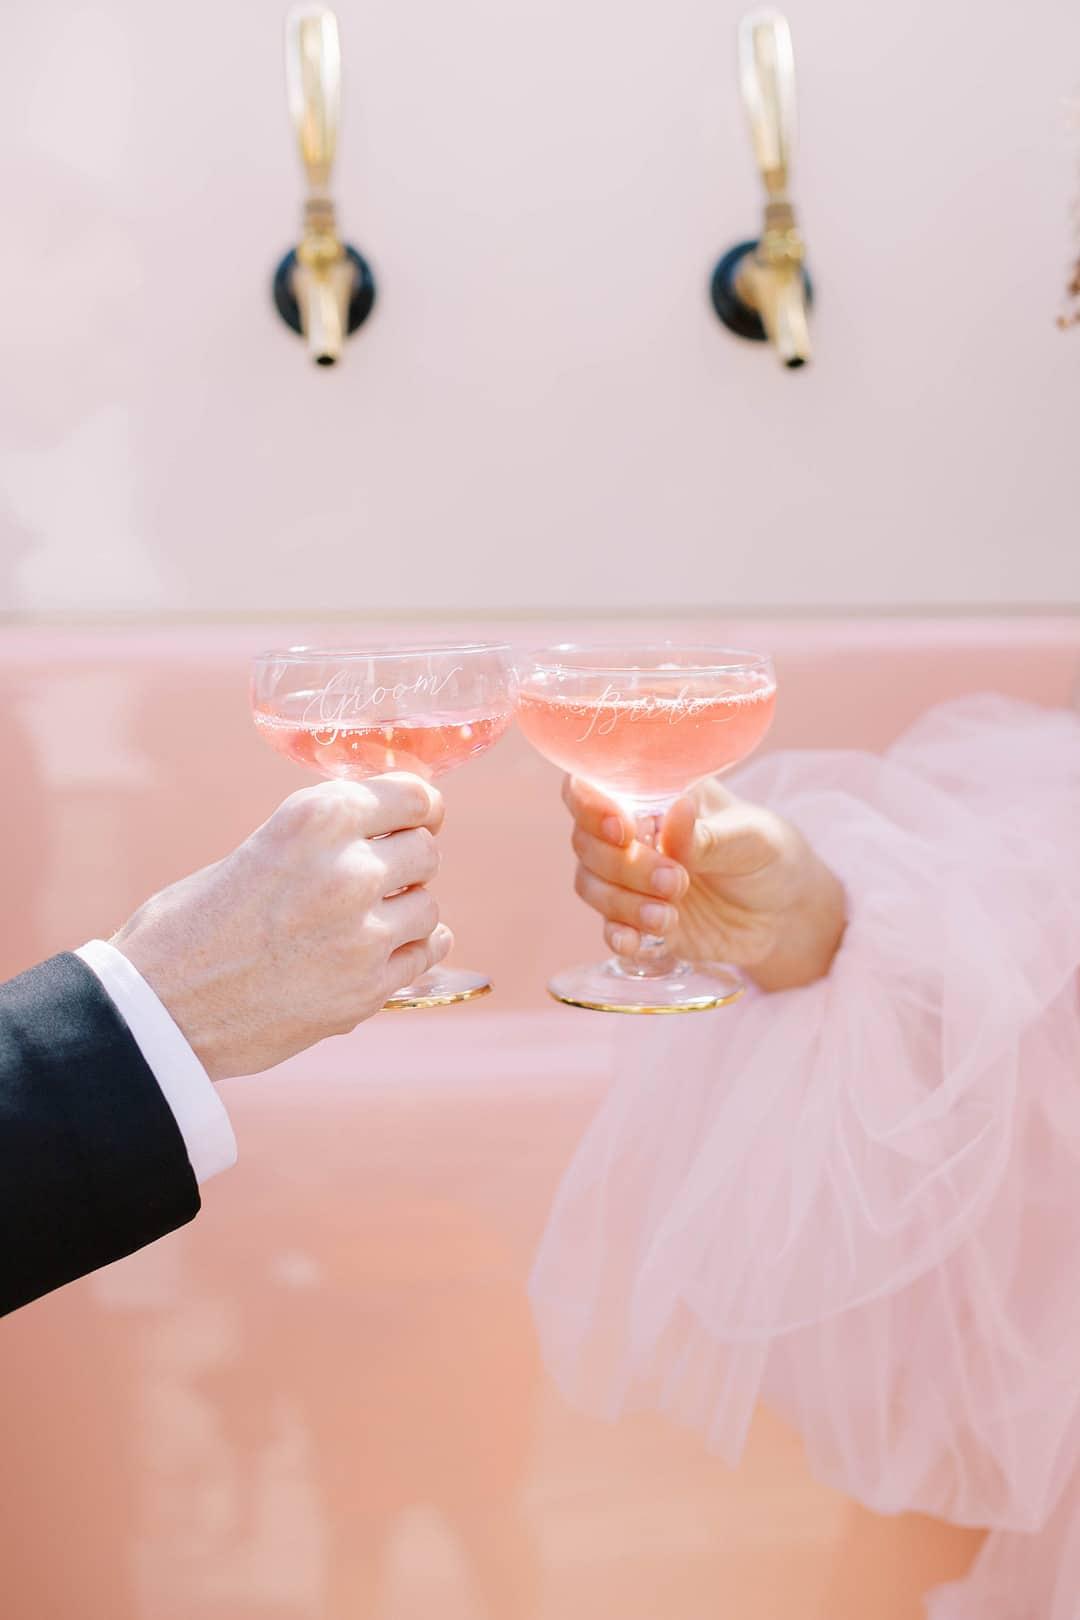 70's Inspired Wedding - Styled Shoot 71